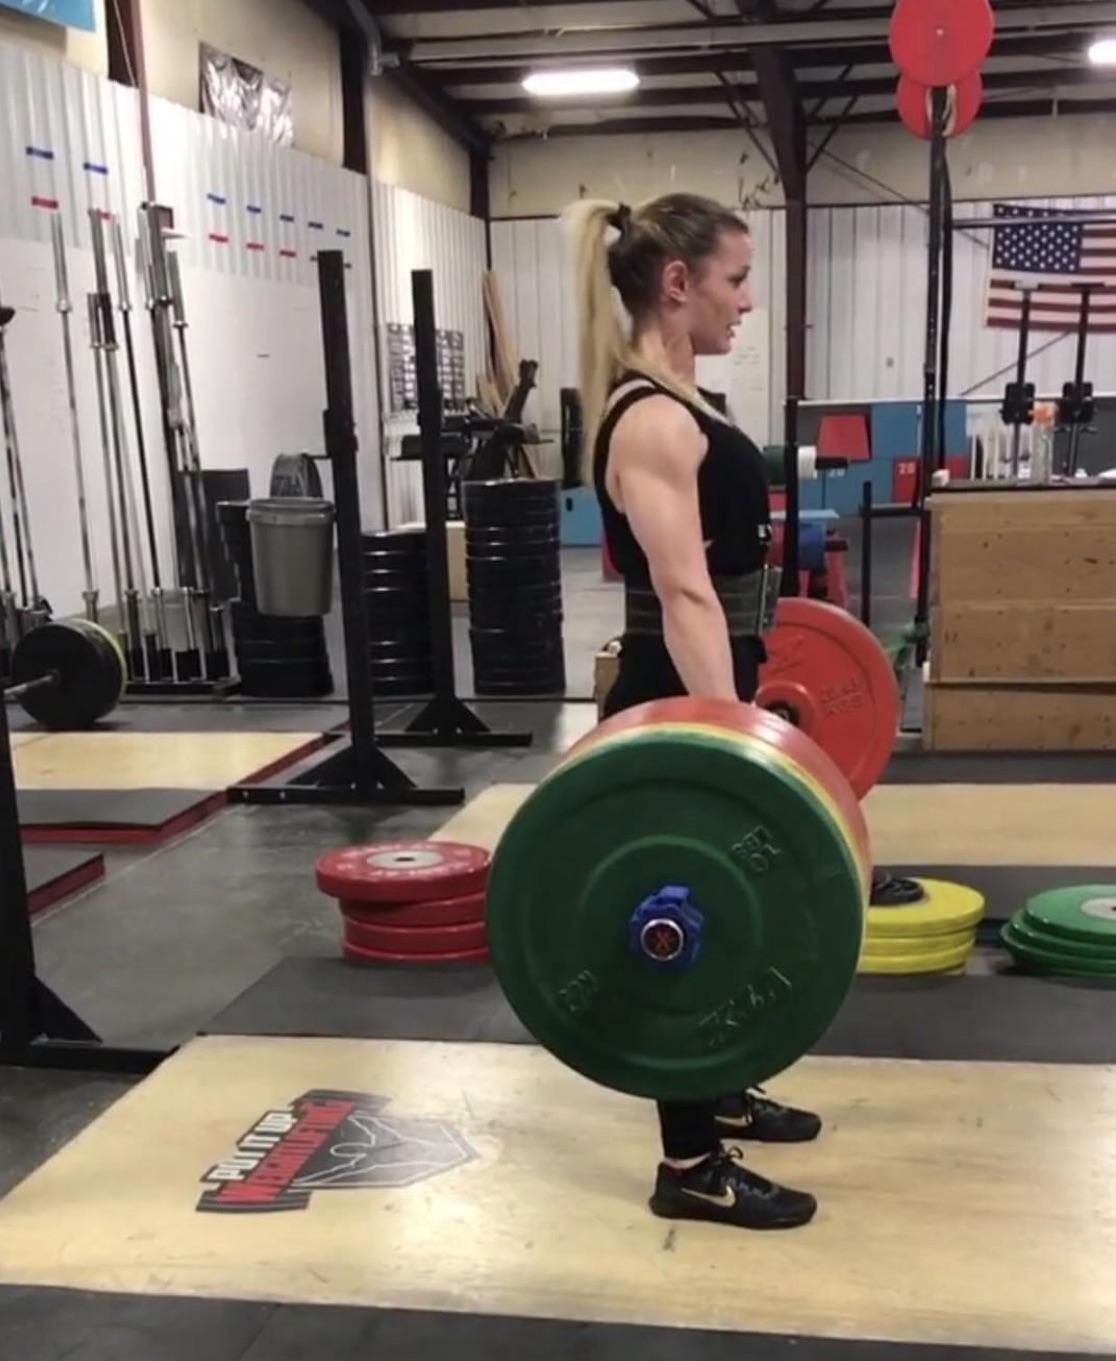 CrossFit athlete Kyra Milligan performing deadlifts